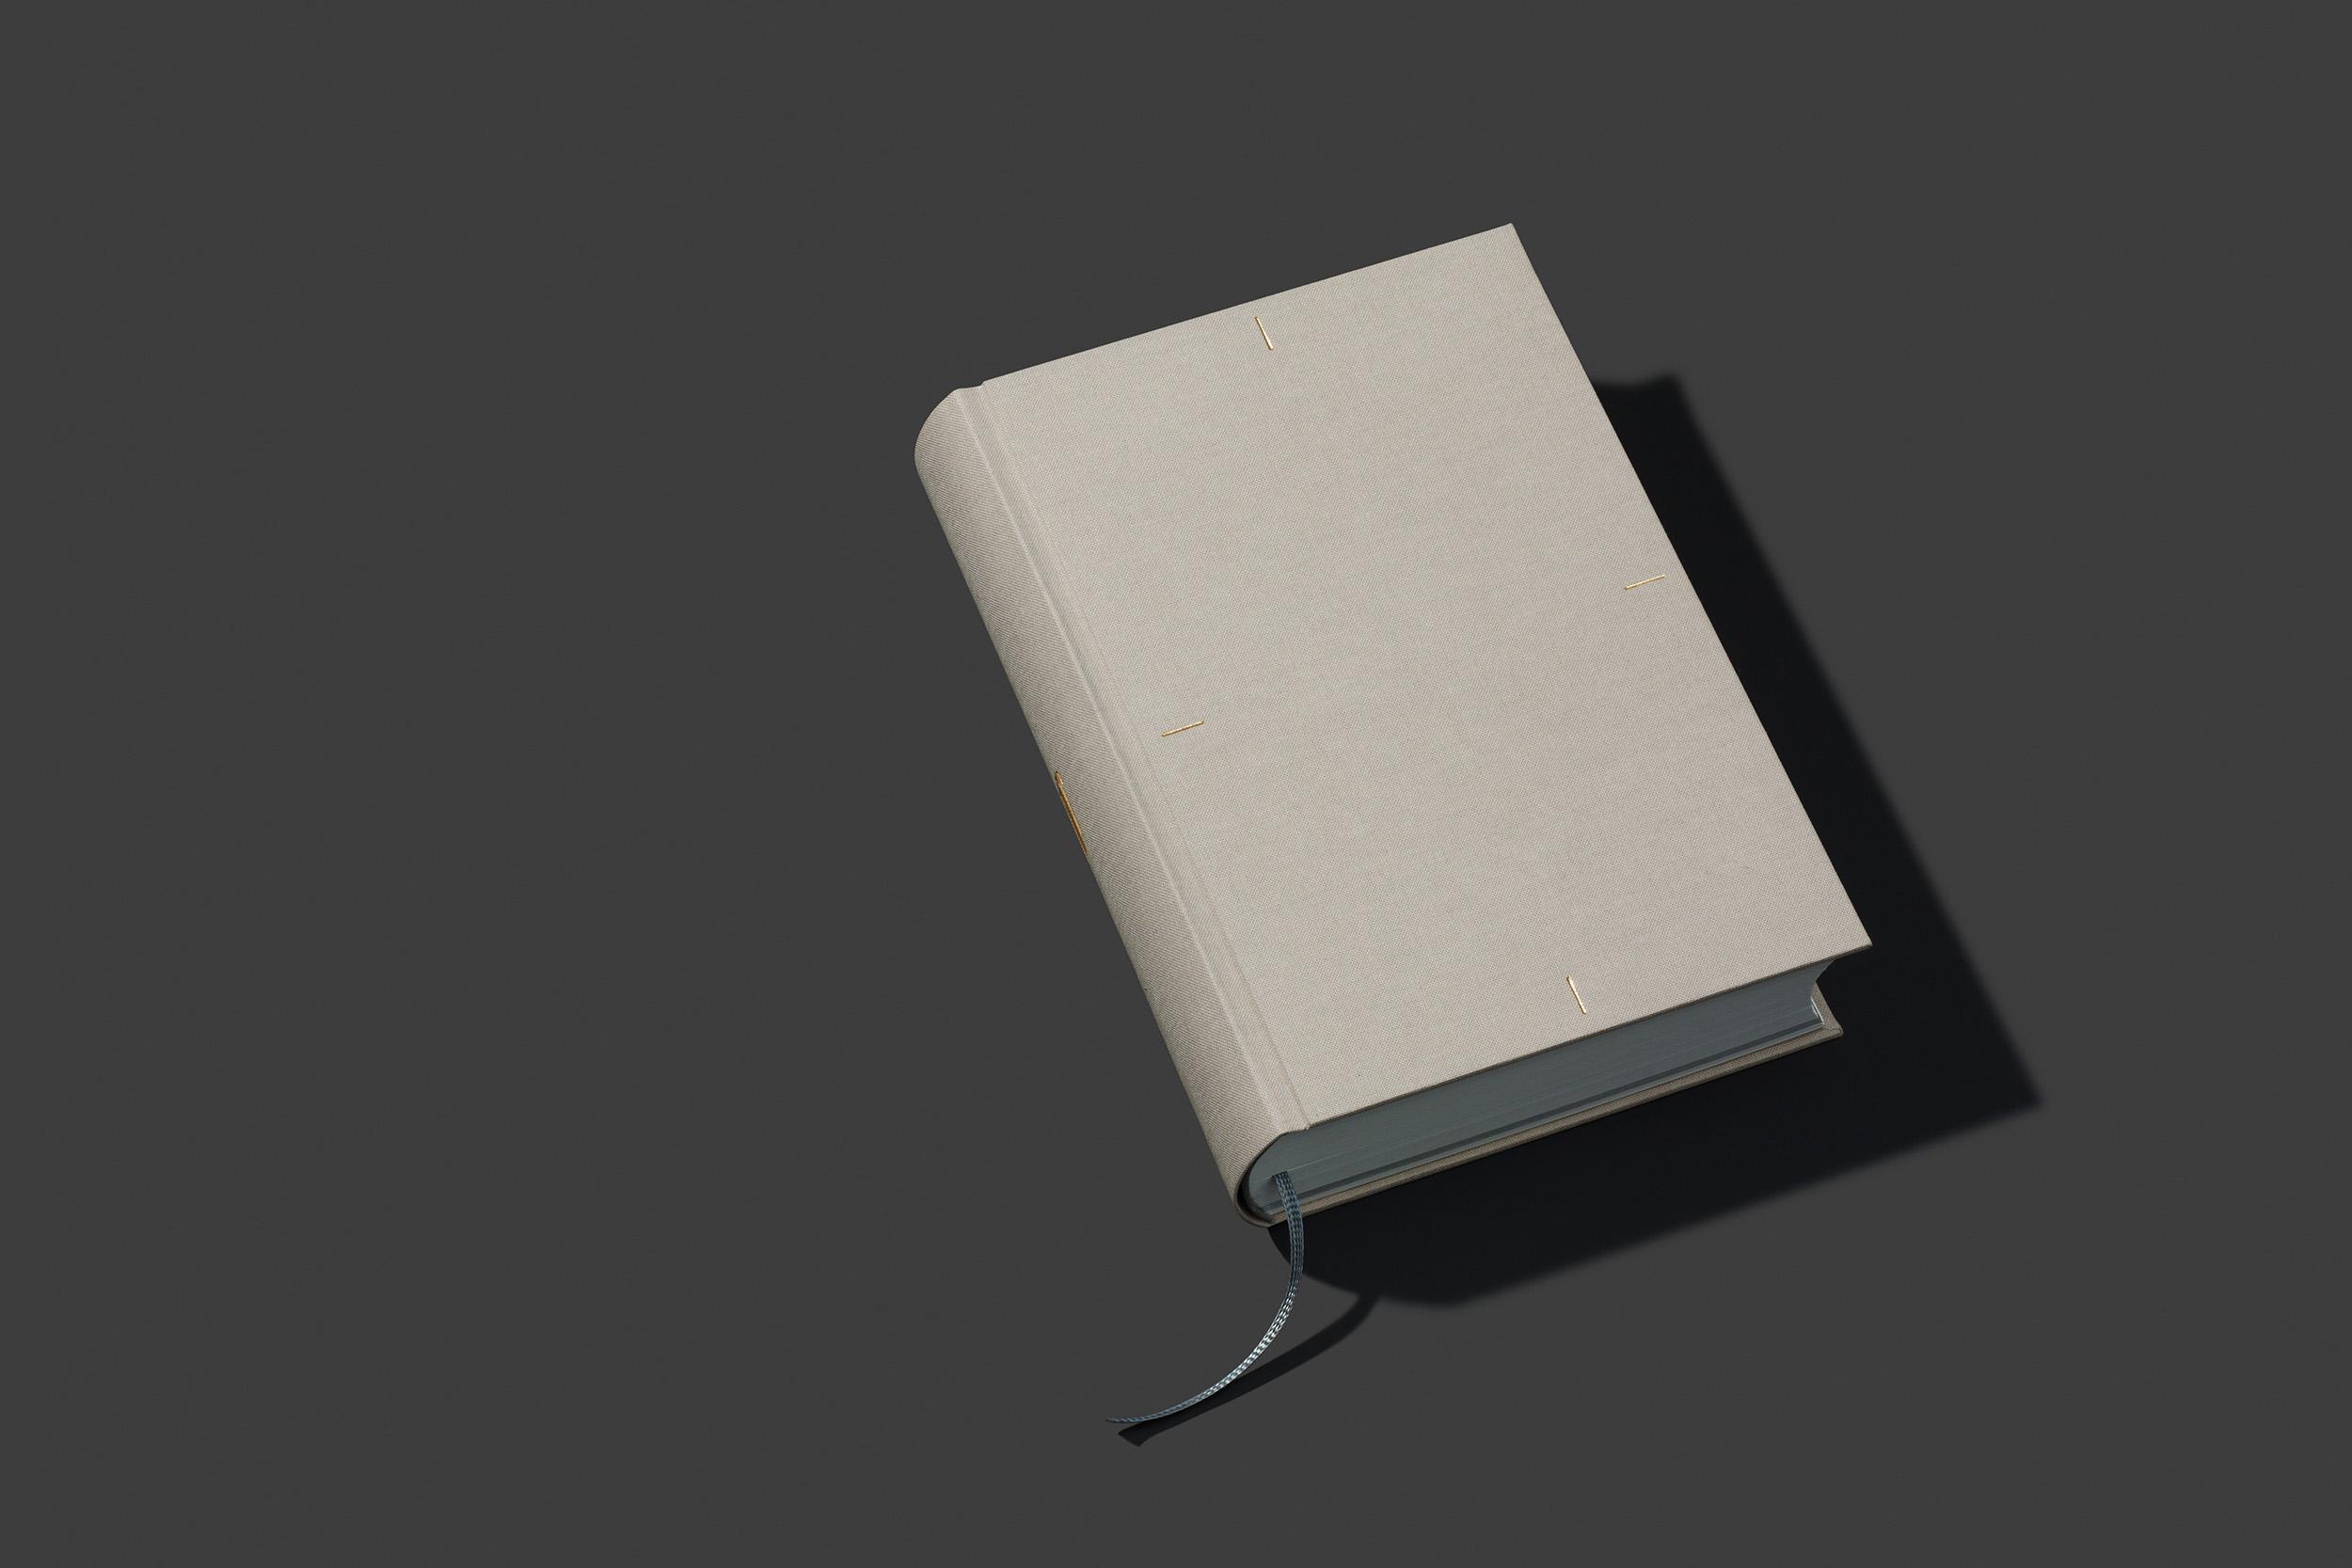 worthless_book_21.jpg